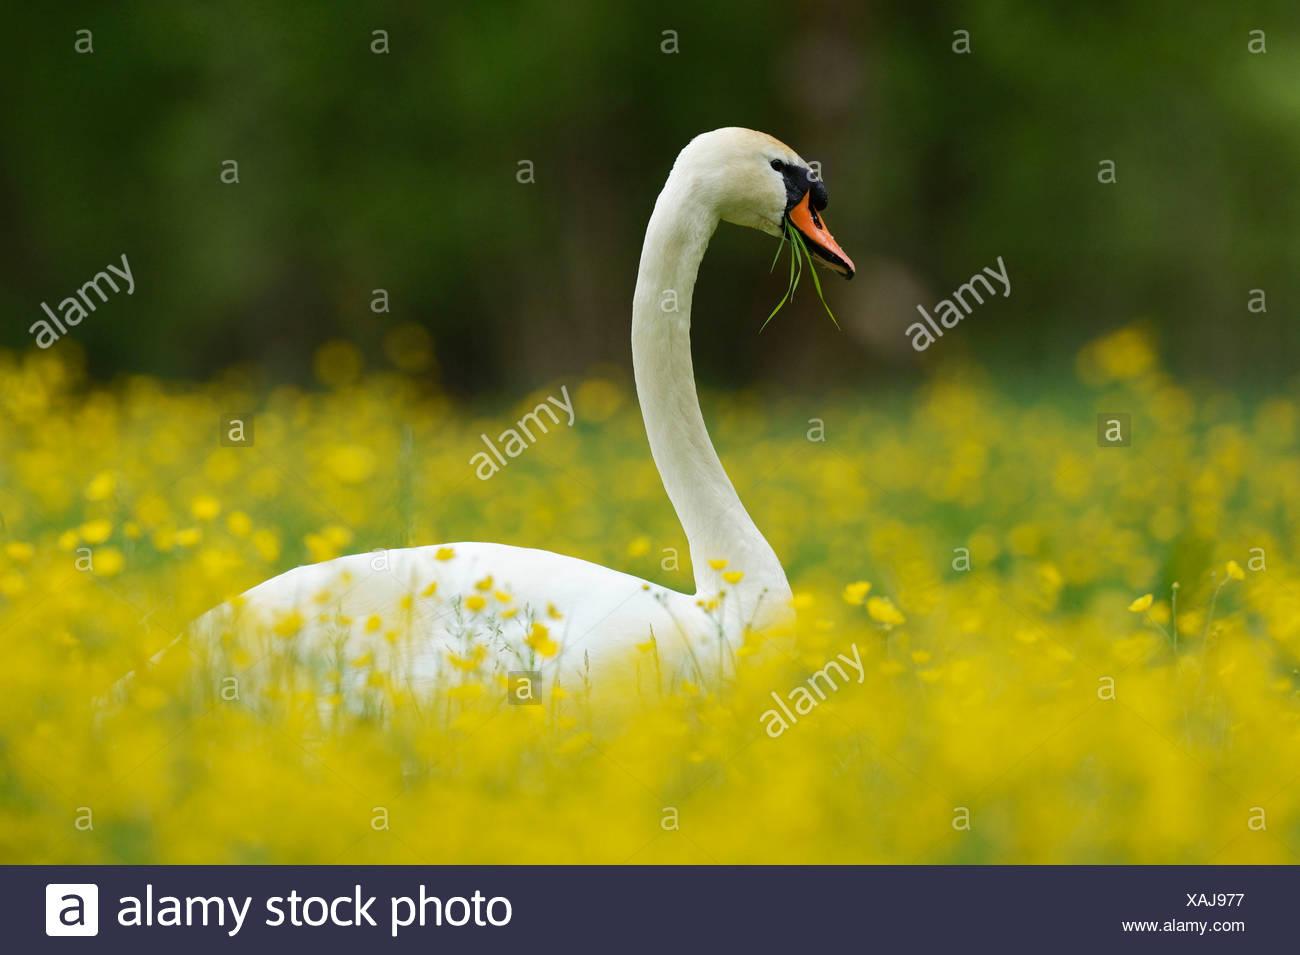 Mute Swan (Cygnus olor) feeding on buttercups (Ranunculus), Sarnen, Canton of Obwalden, Switzerland - Stock Image